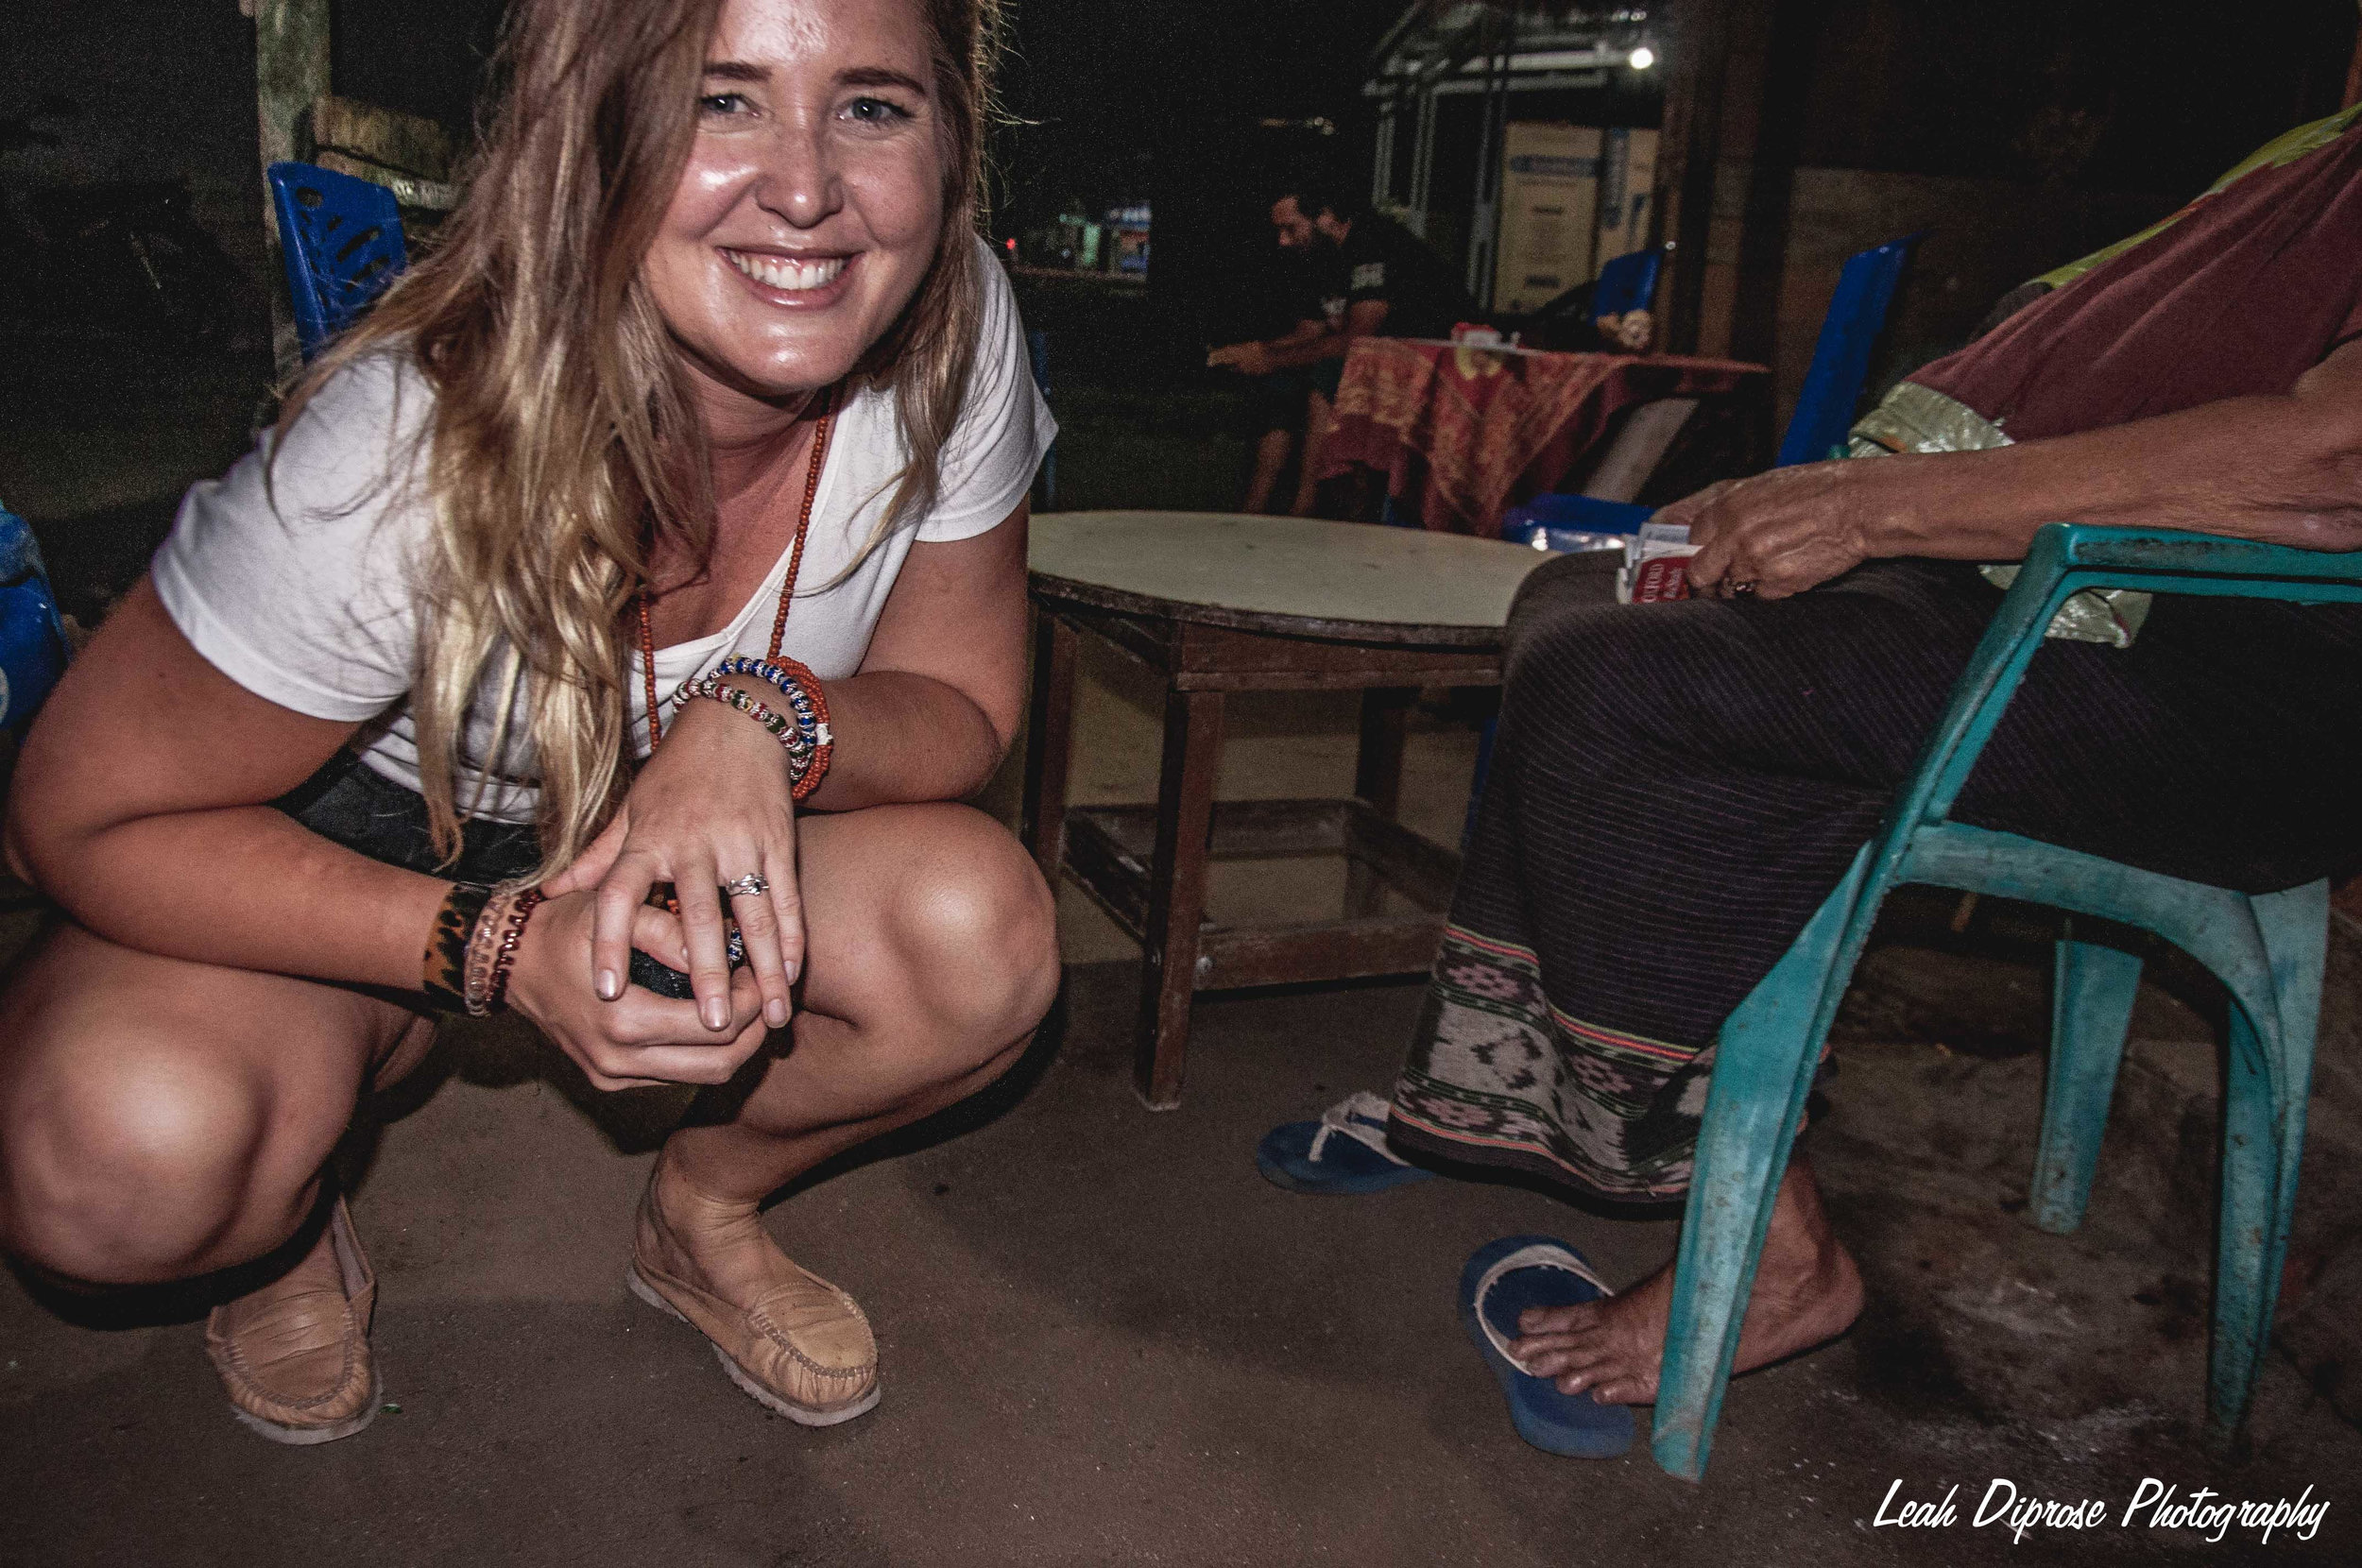 Leah Diprose Photography image-5505.jpg